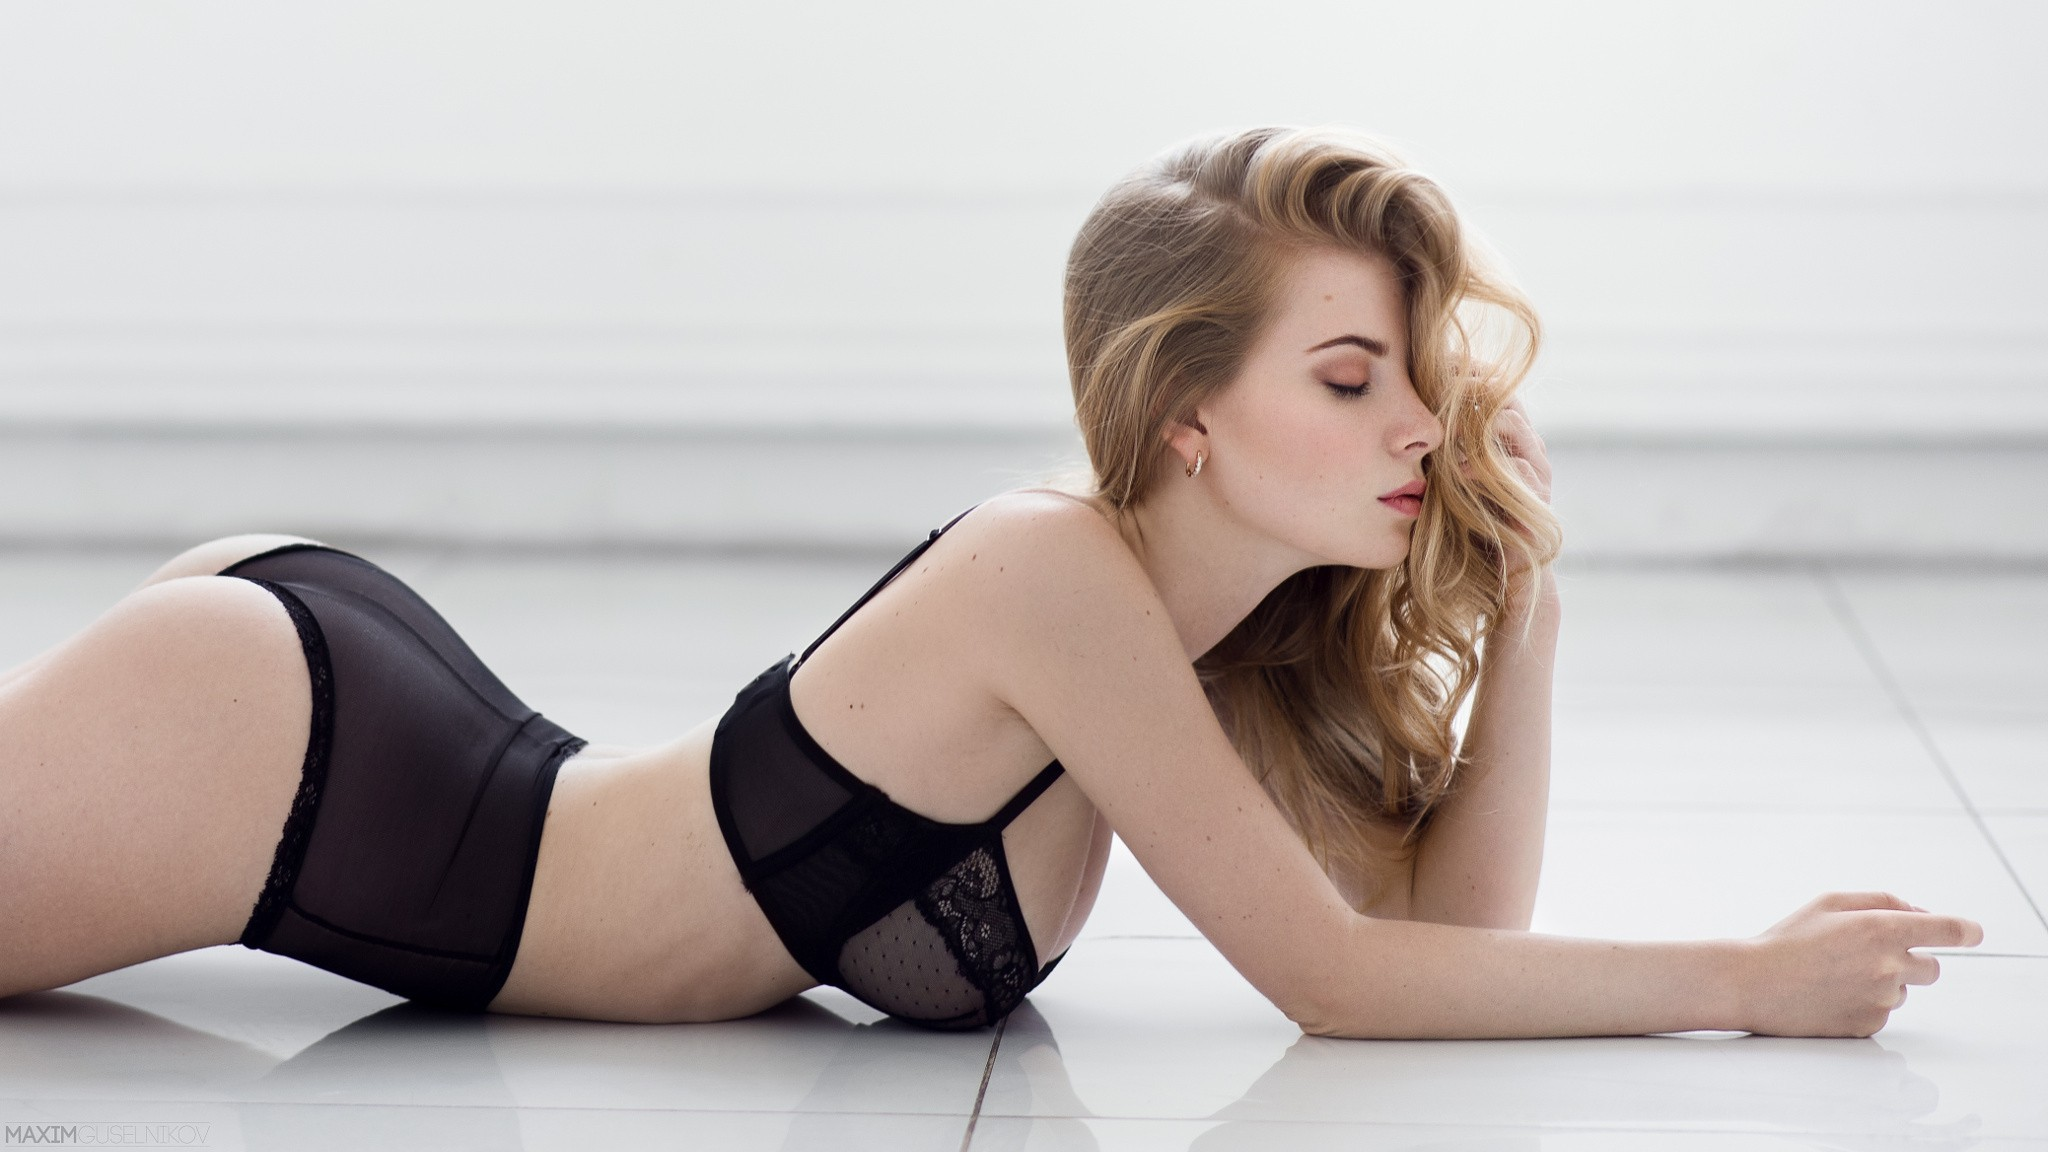 Irina Popova Sexy Photos